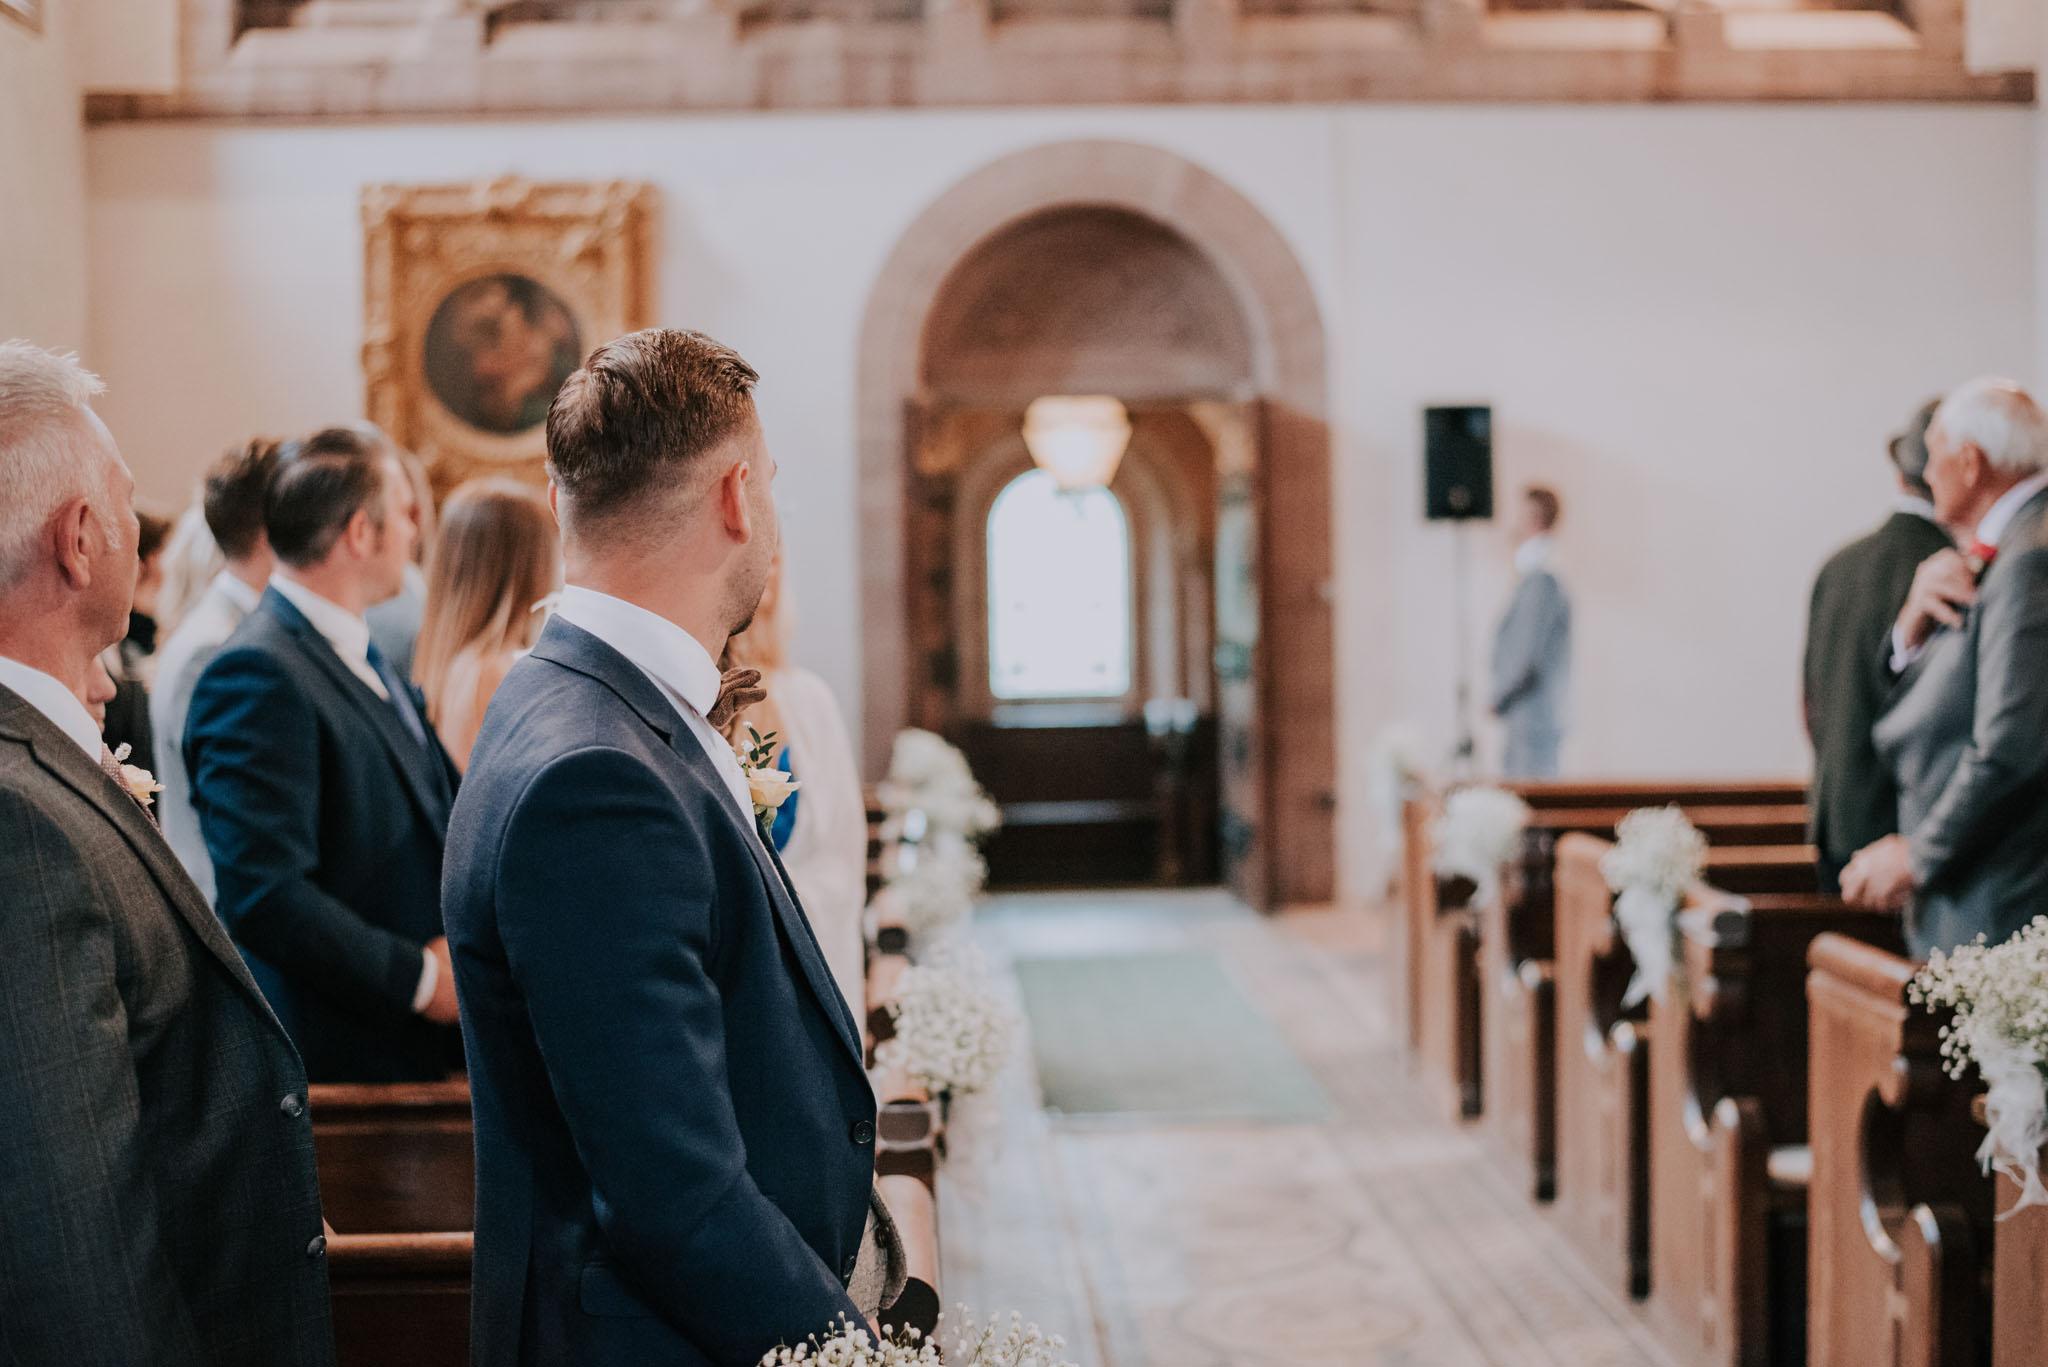 wedding-photographer-glewstone-court-hereford-scott-stockwell-photography155.jpg